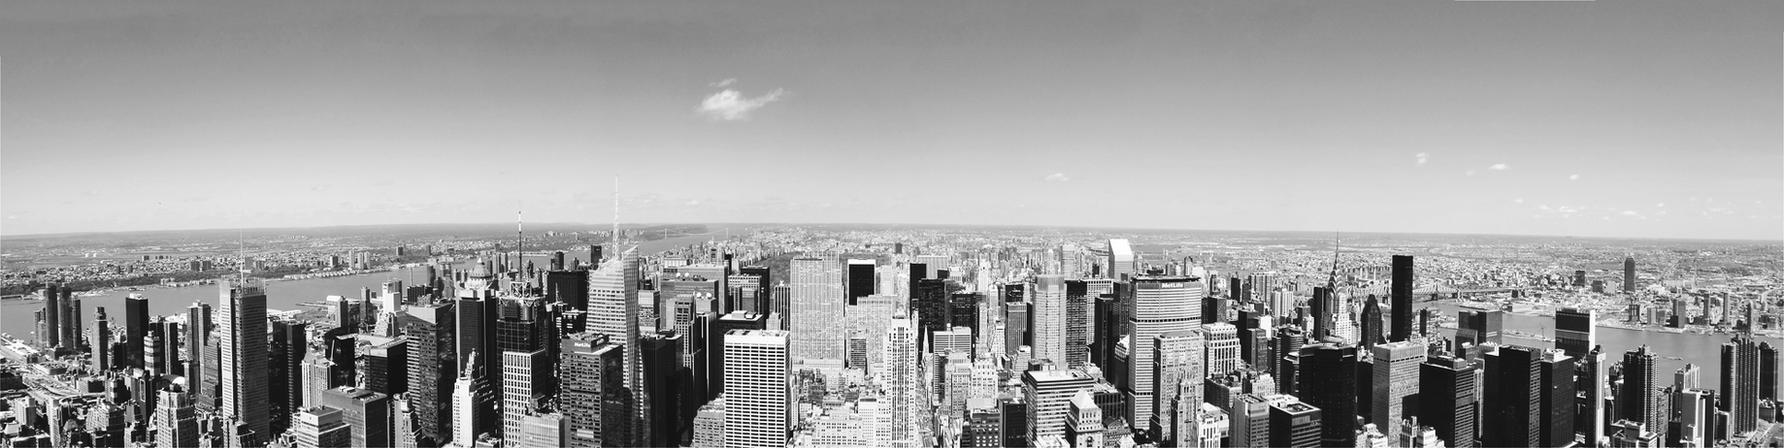 Nueva York 2 by Malopz